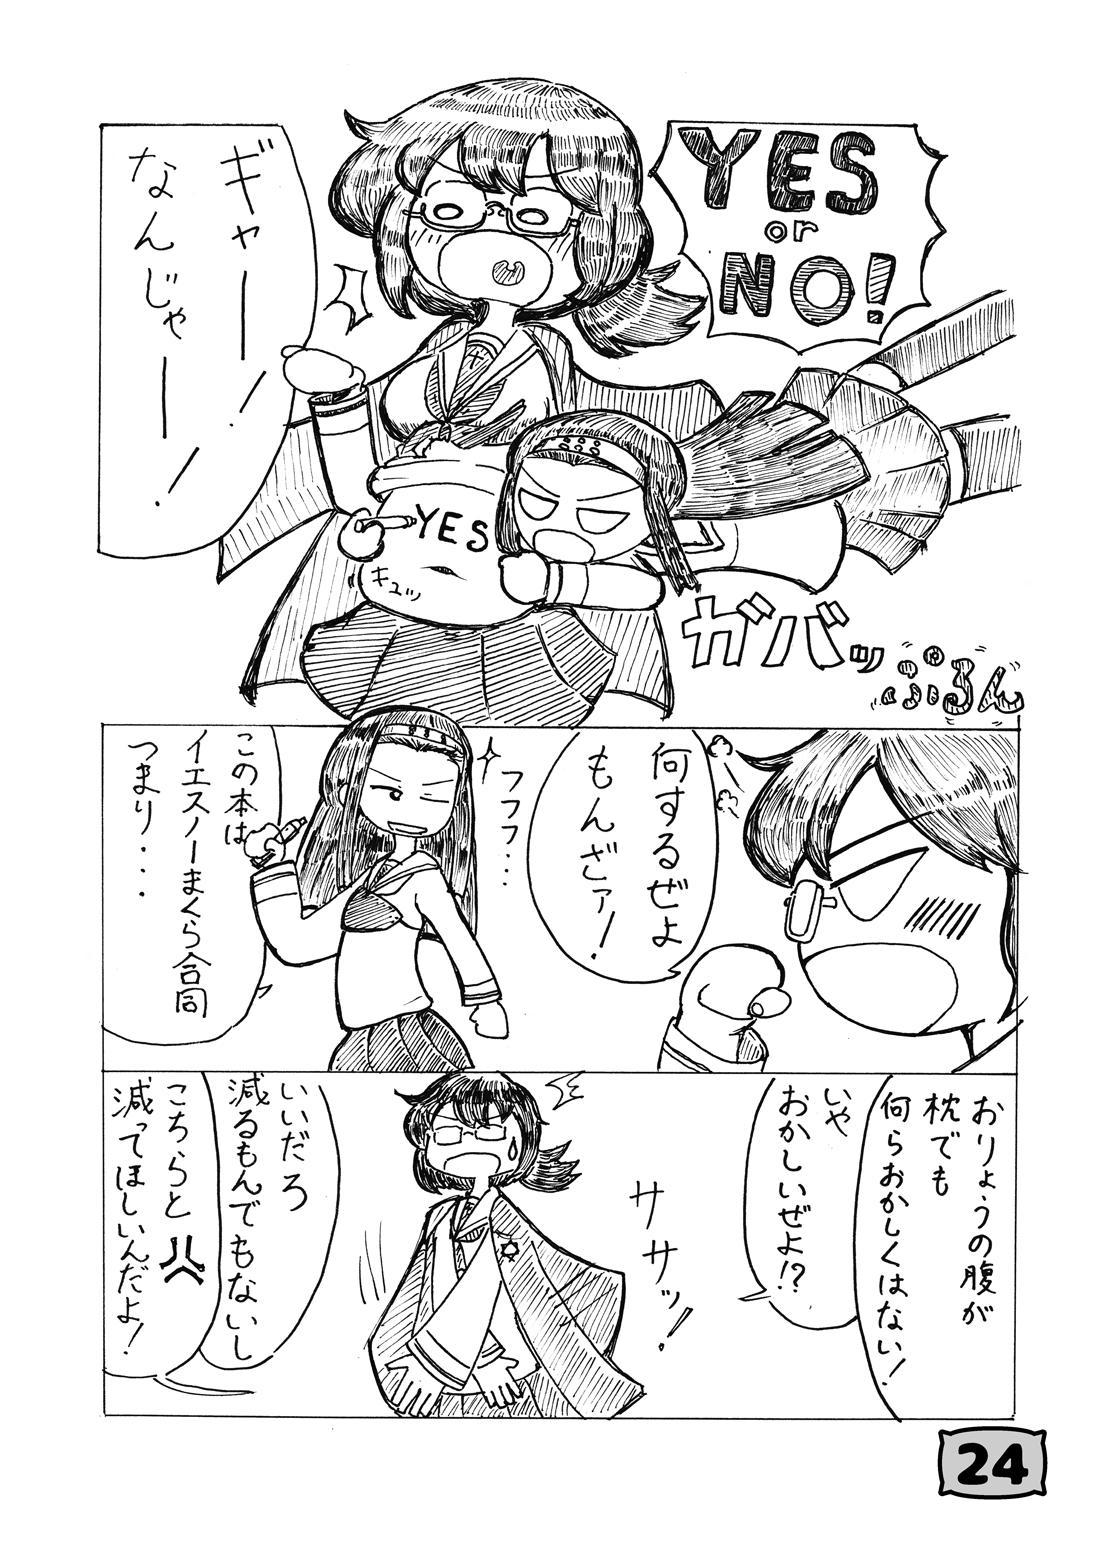 GirlPan YES/NO Makura Goudoushi 19